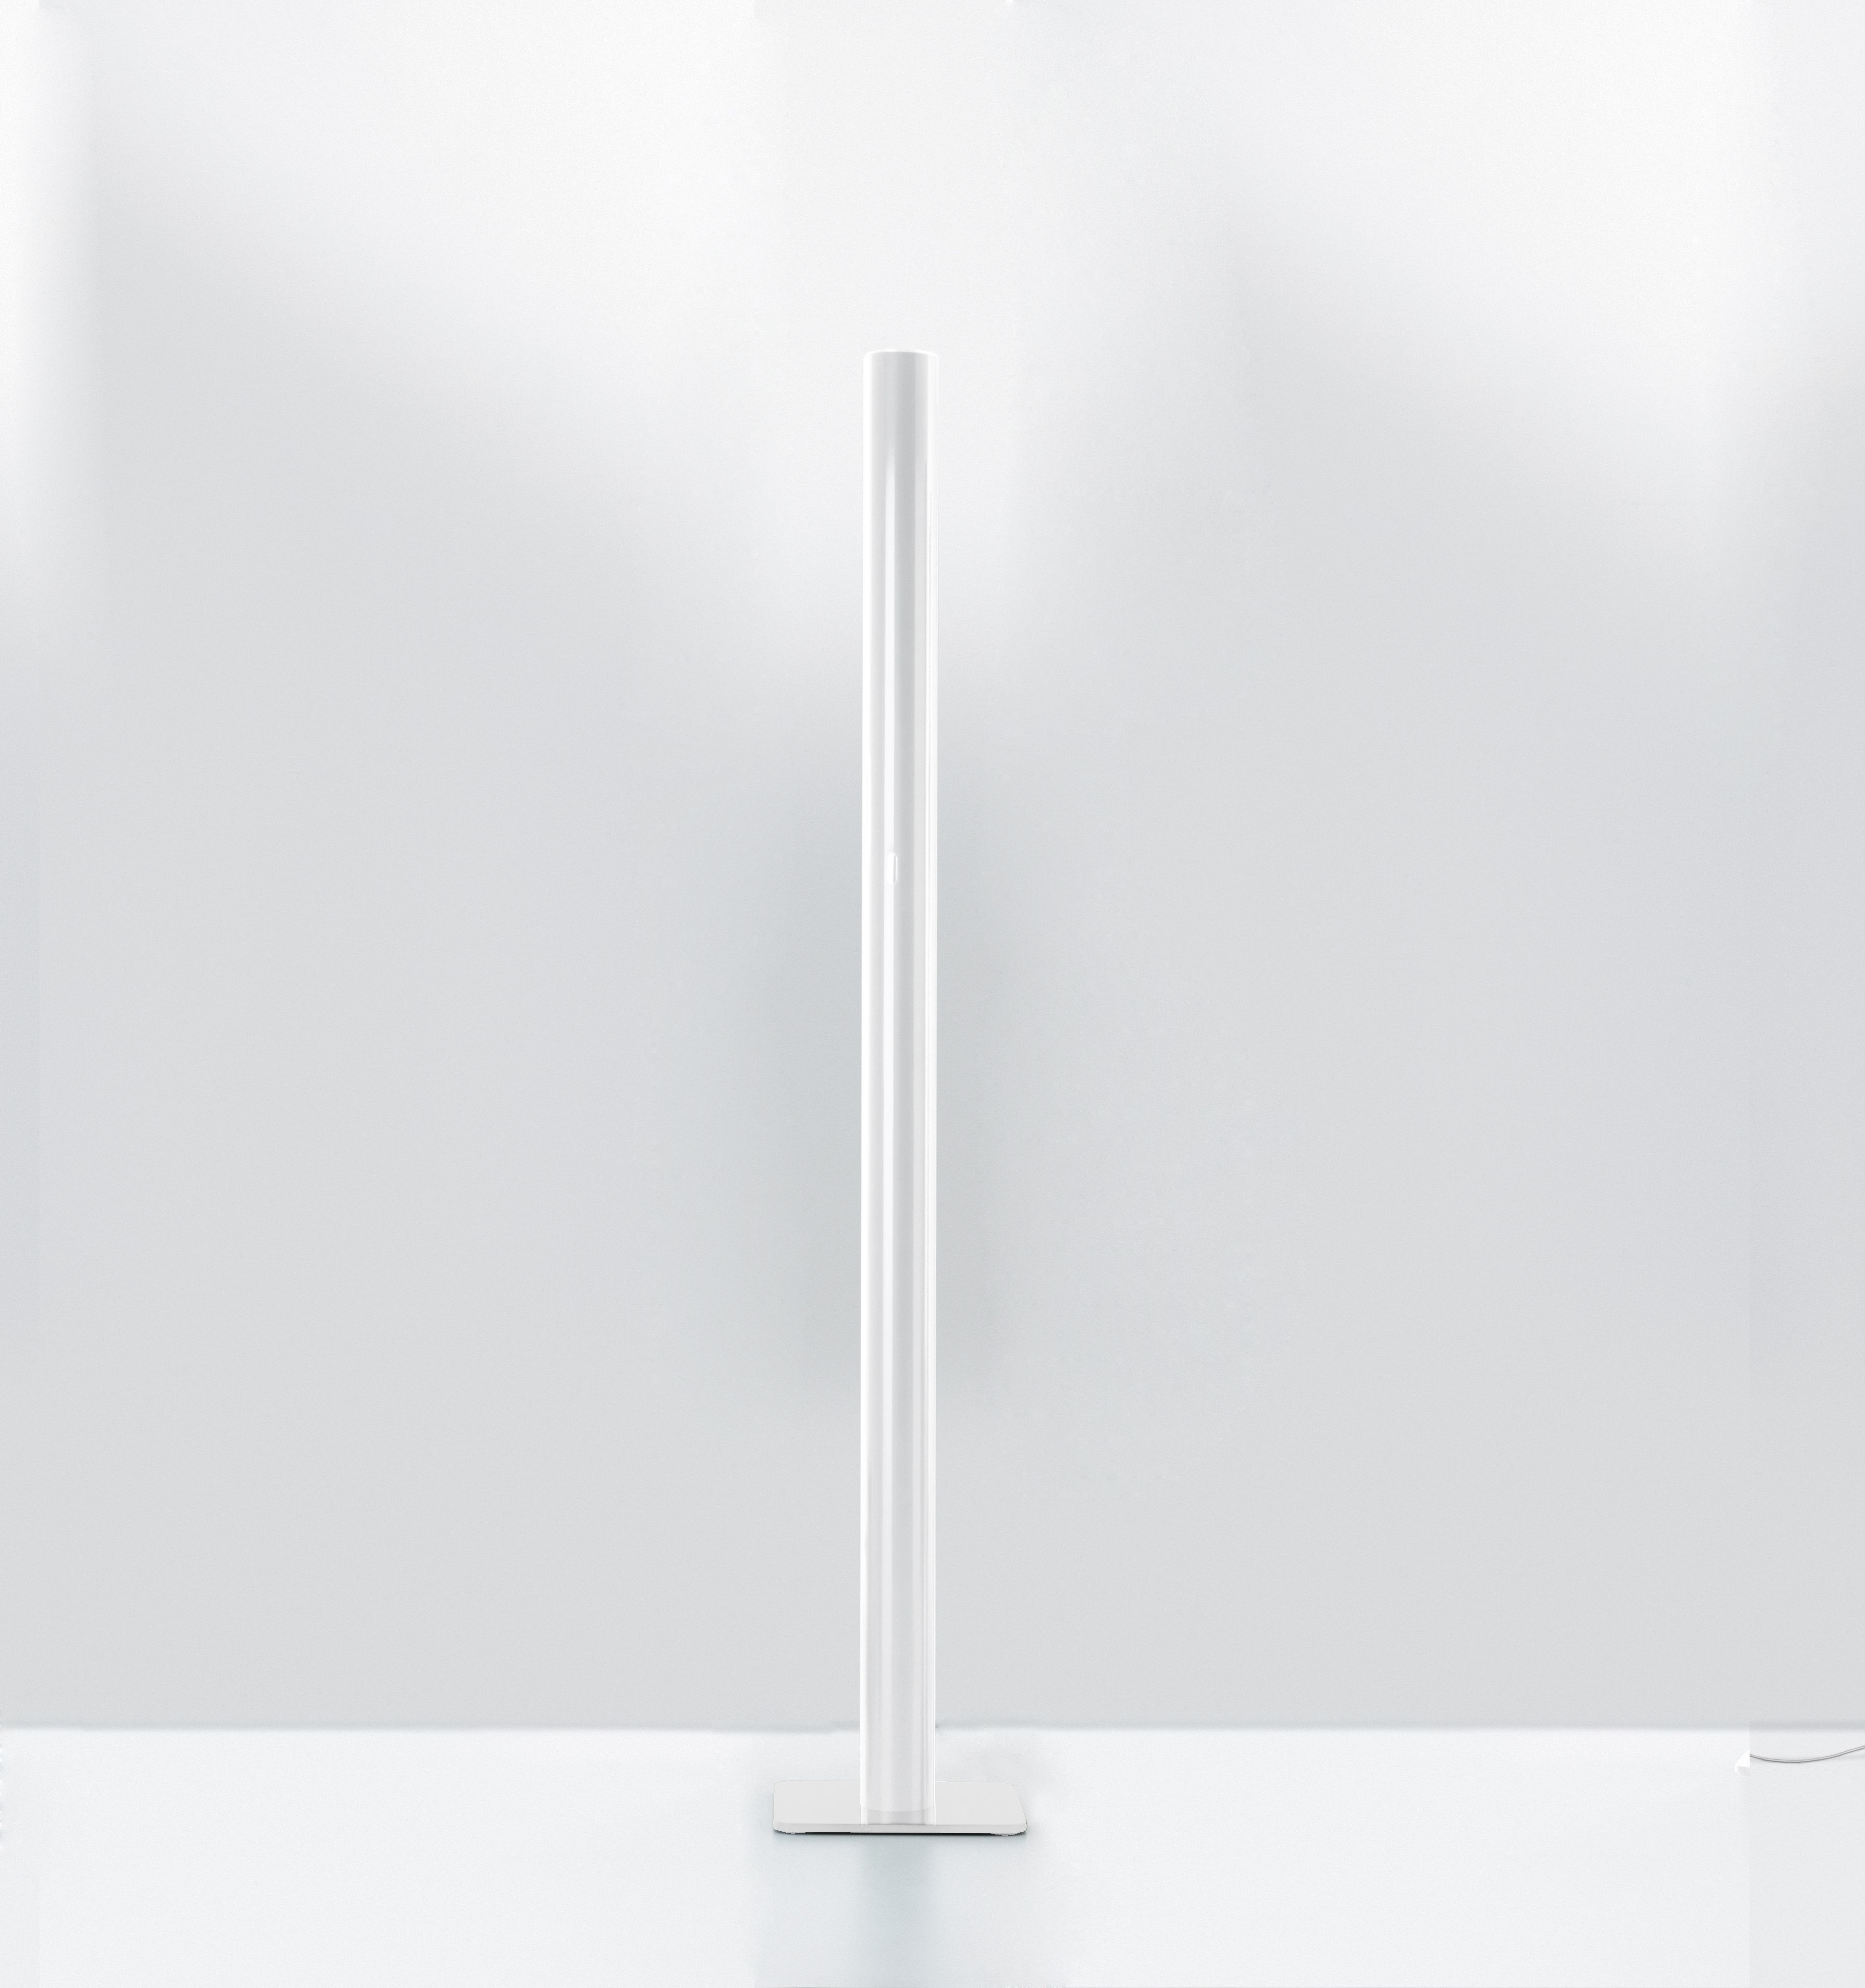 Artemide Ilio LED Deckenfluter Weiss Bei Lampenonlinede Unter Lampenonline De